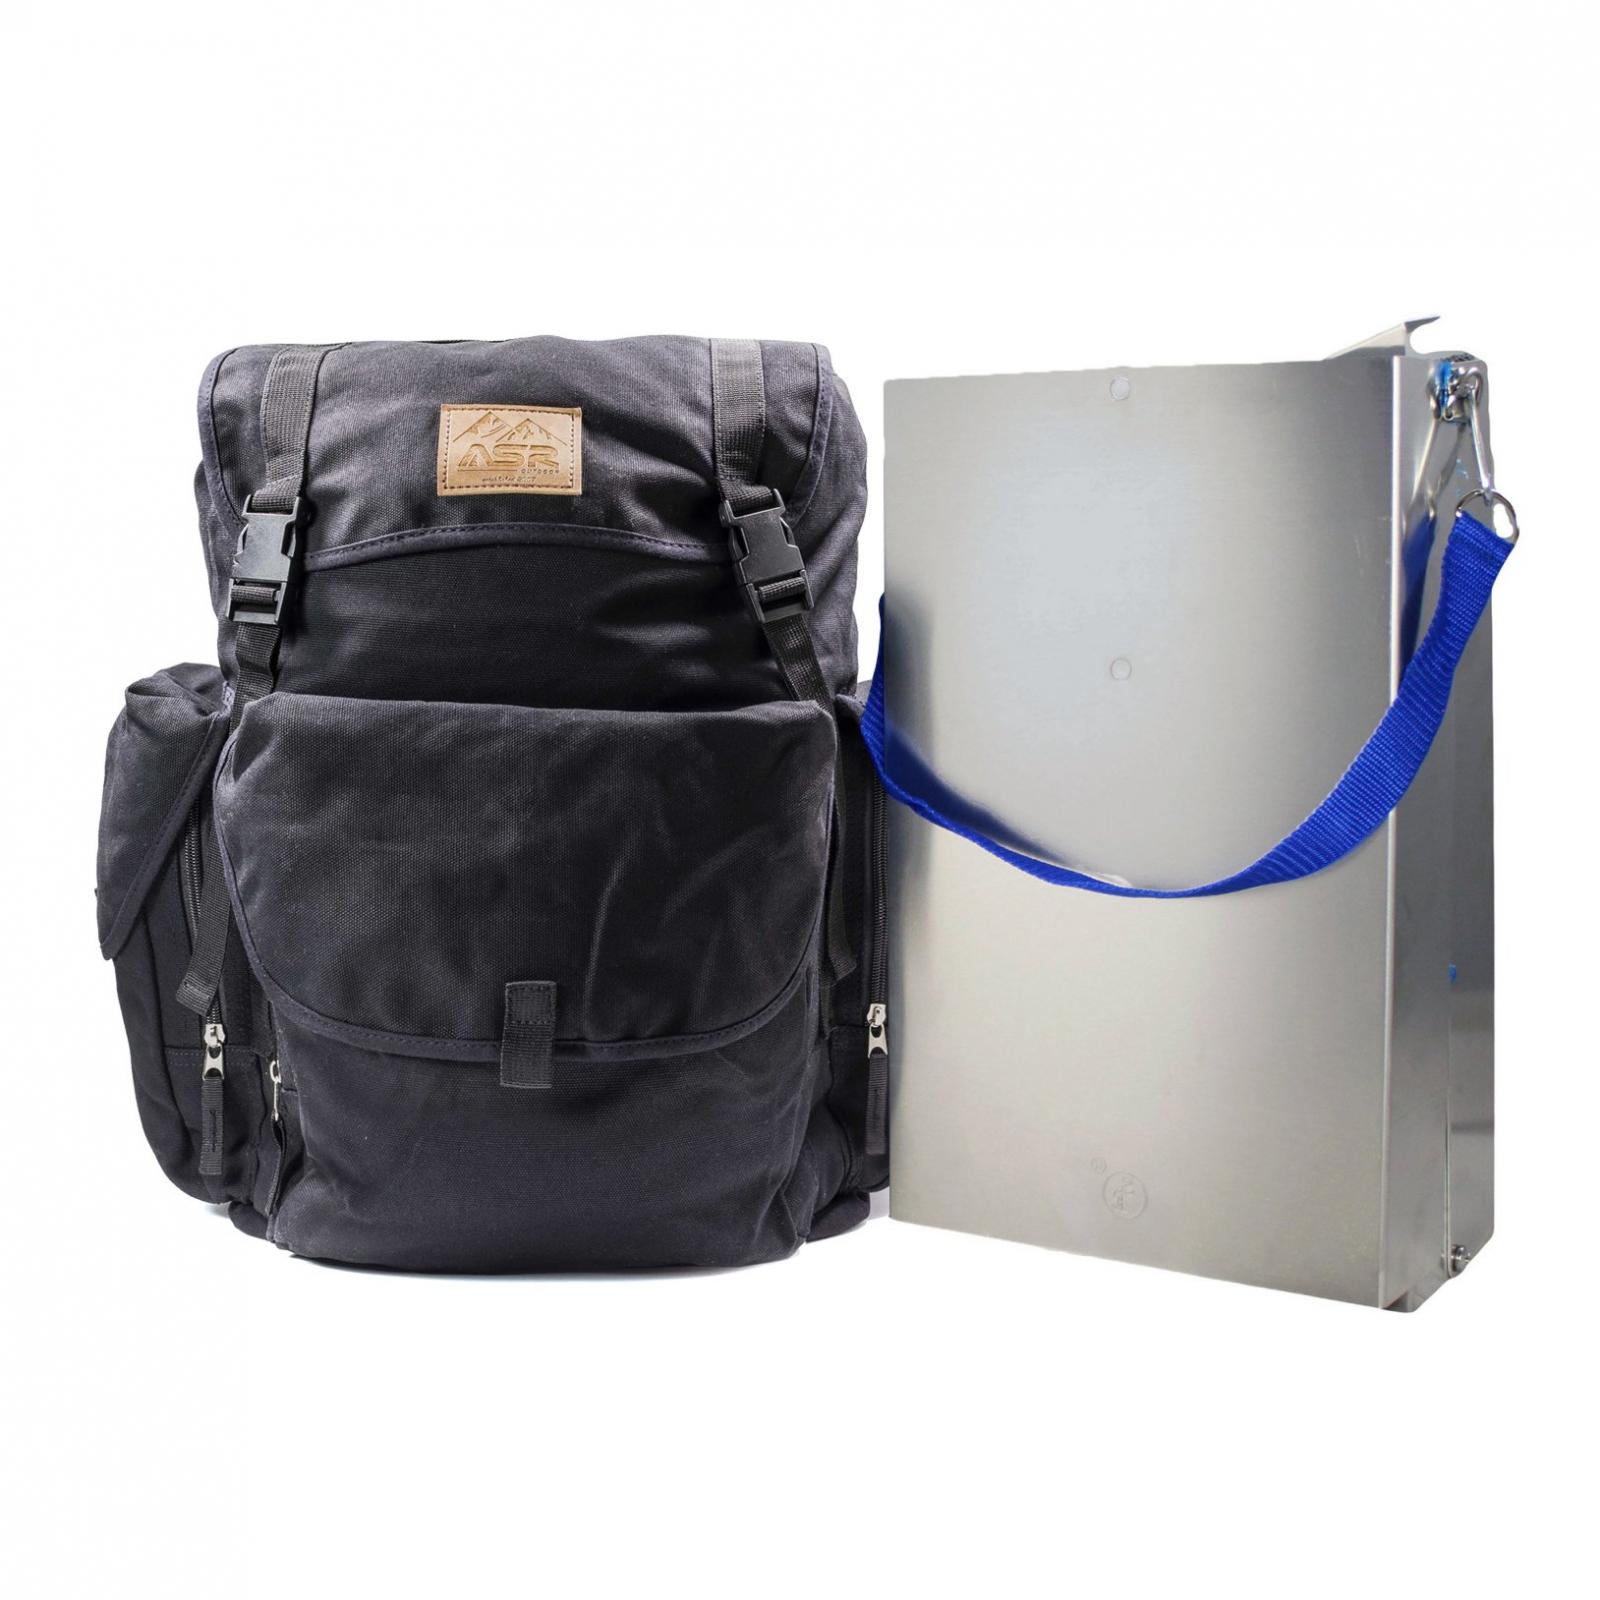 "ASR Outdoor 50"" Aluminum Folding Sluice Box for Gold Prospecting Backpack Set"